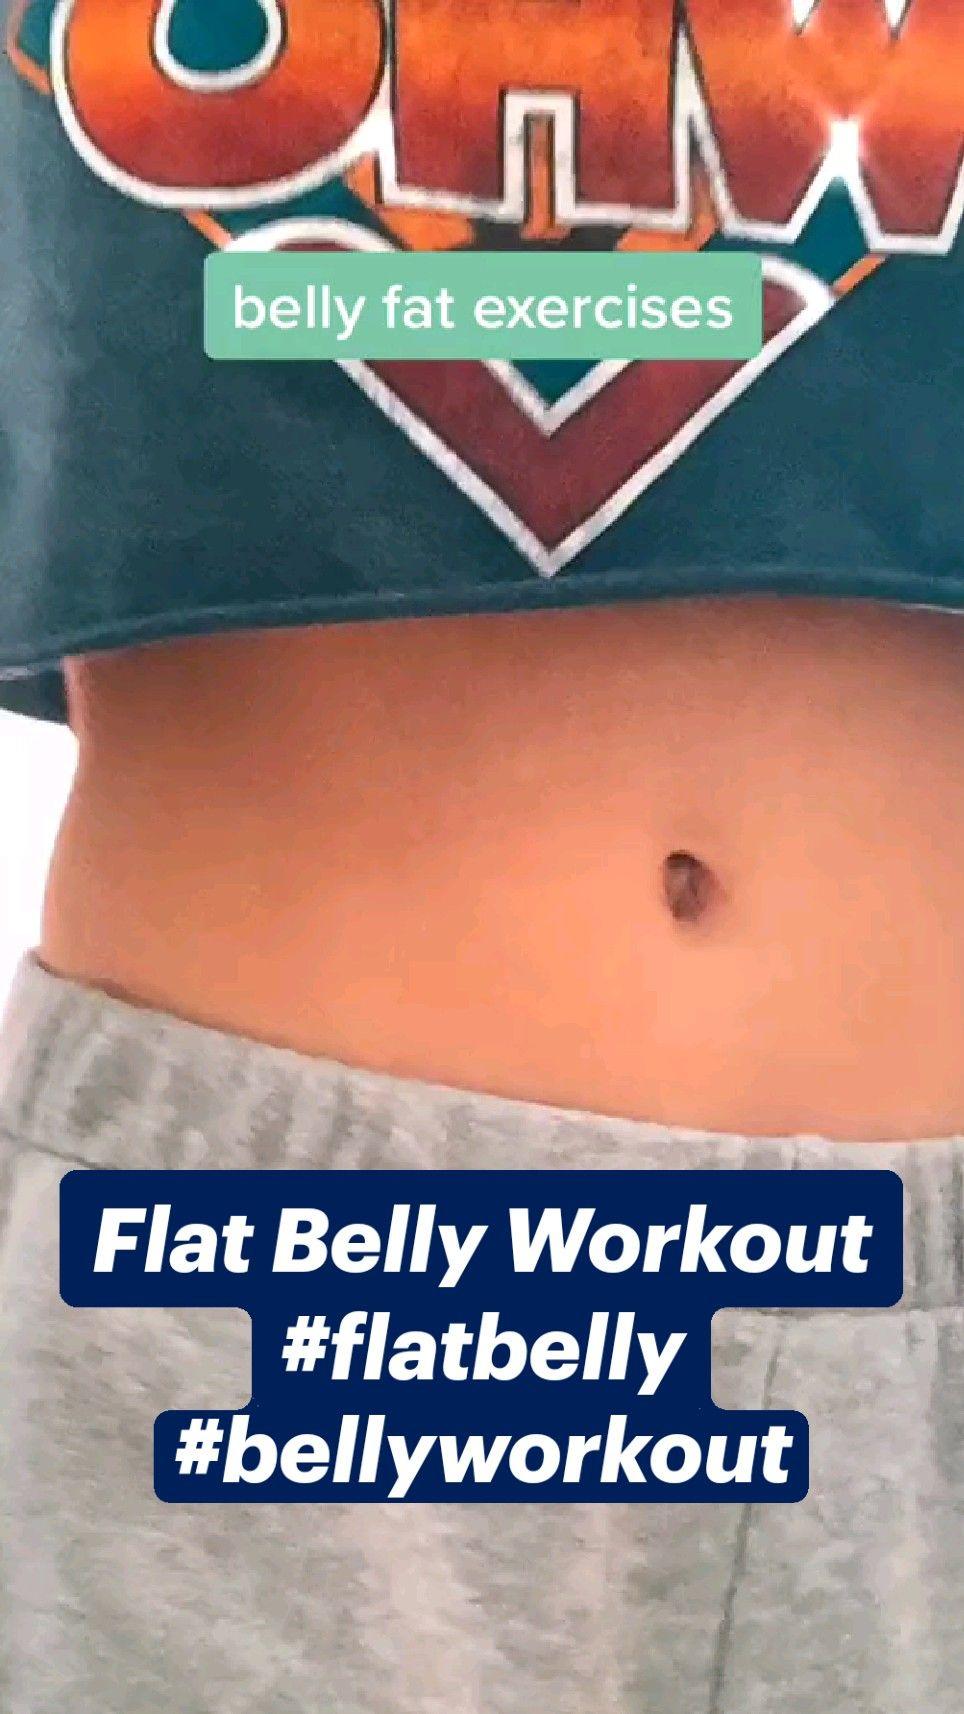 Flat Belly Workout #flatbelly #bellyworkout